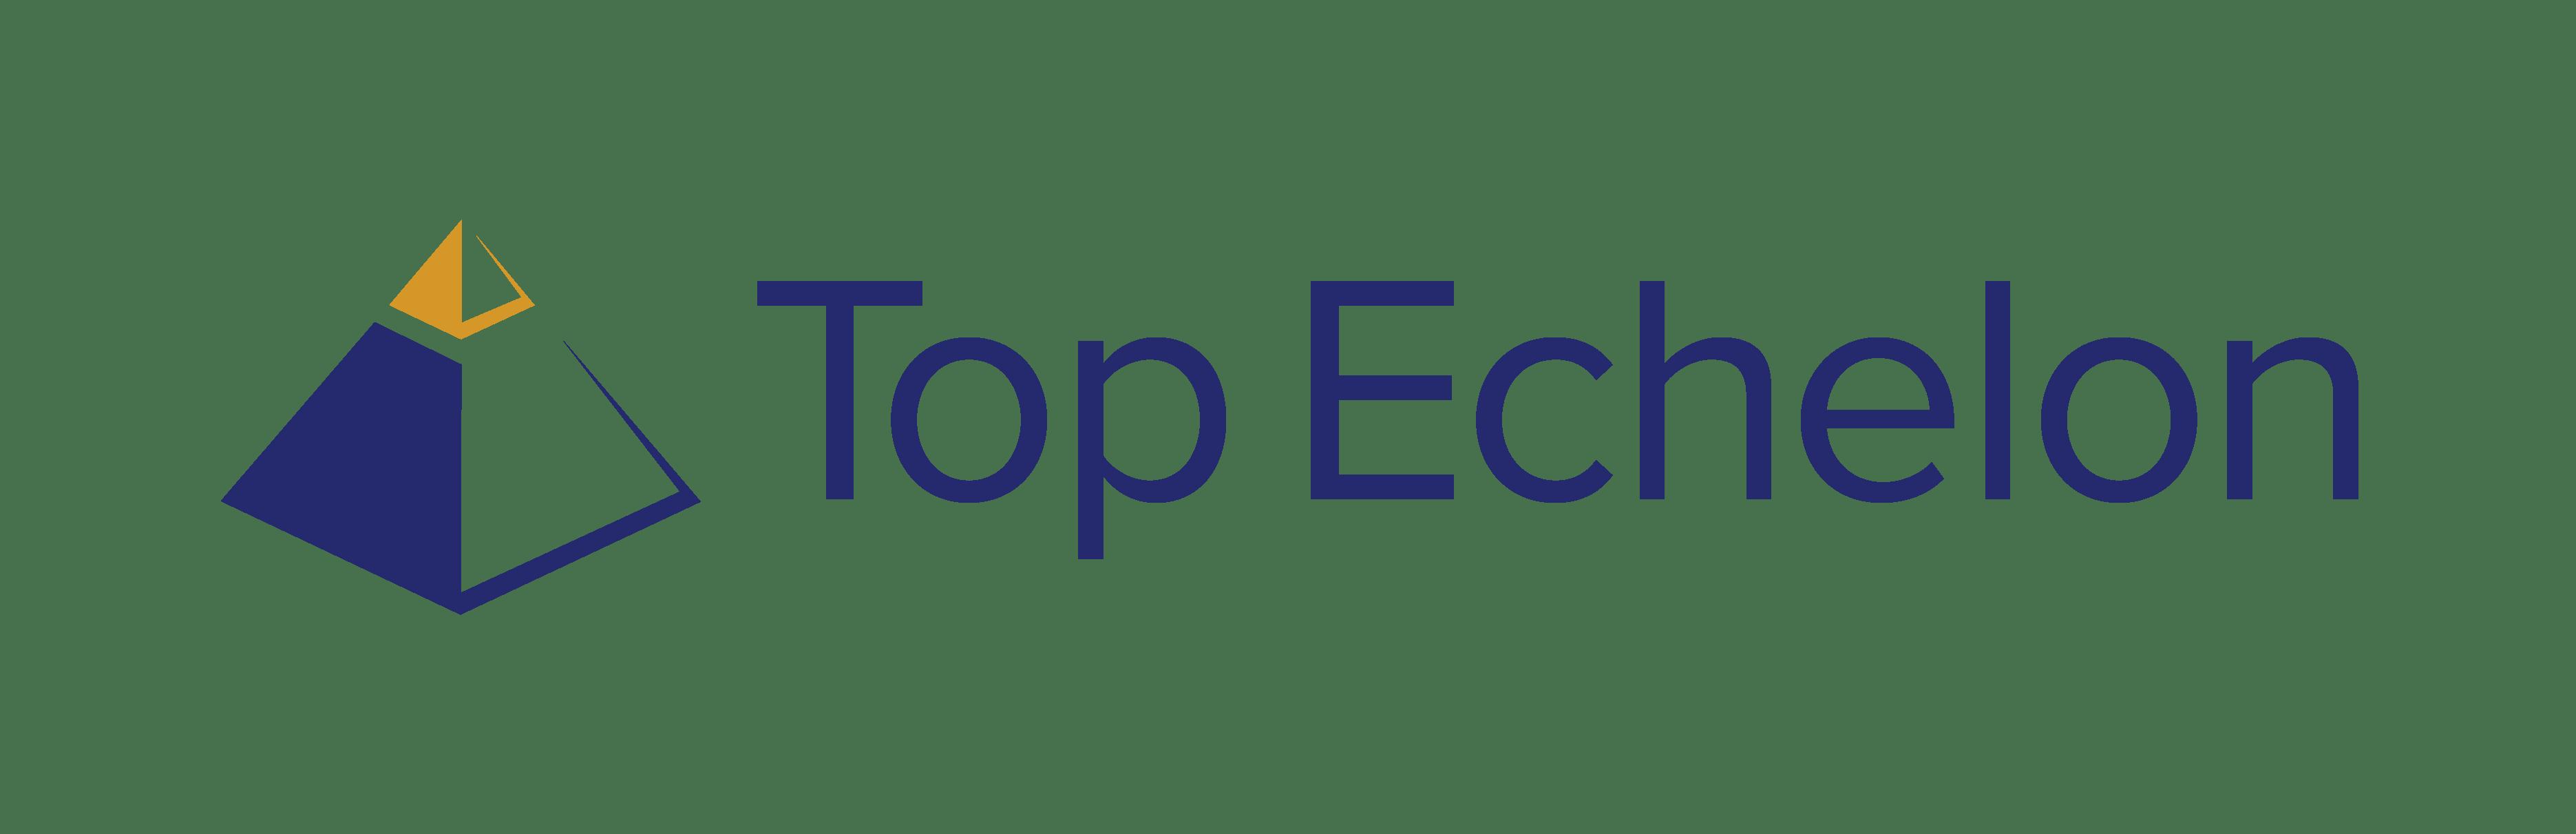 Top-Echelon-Logo